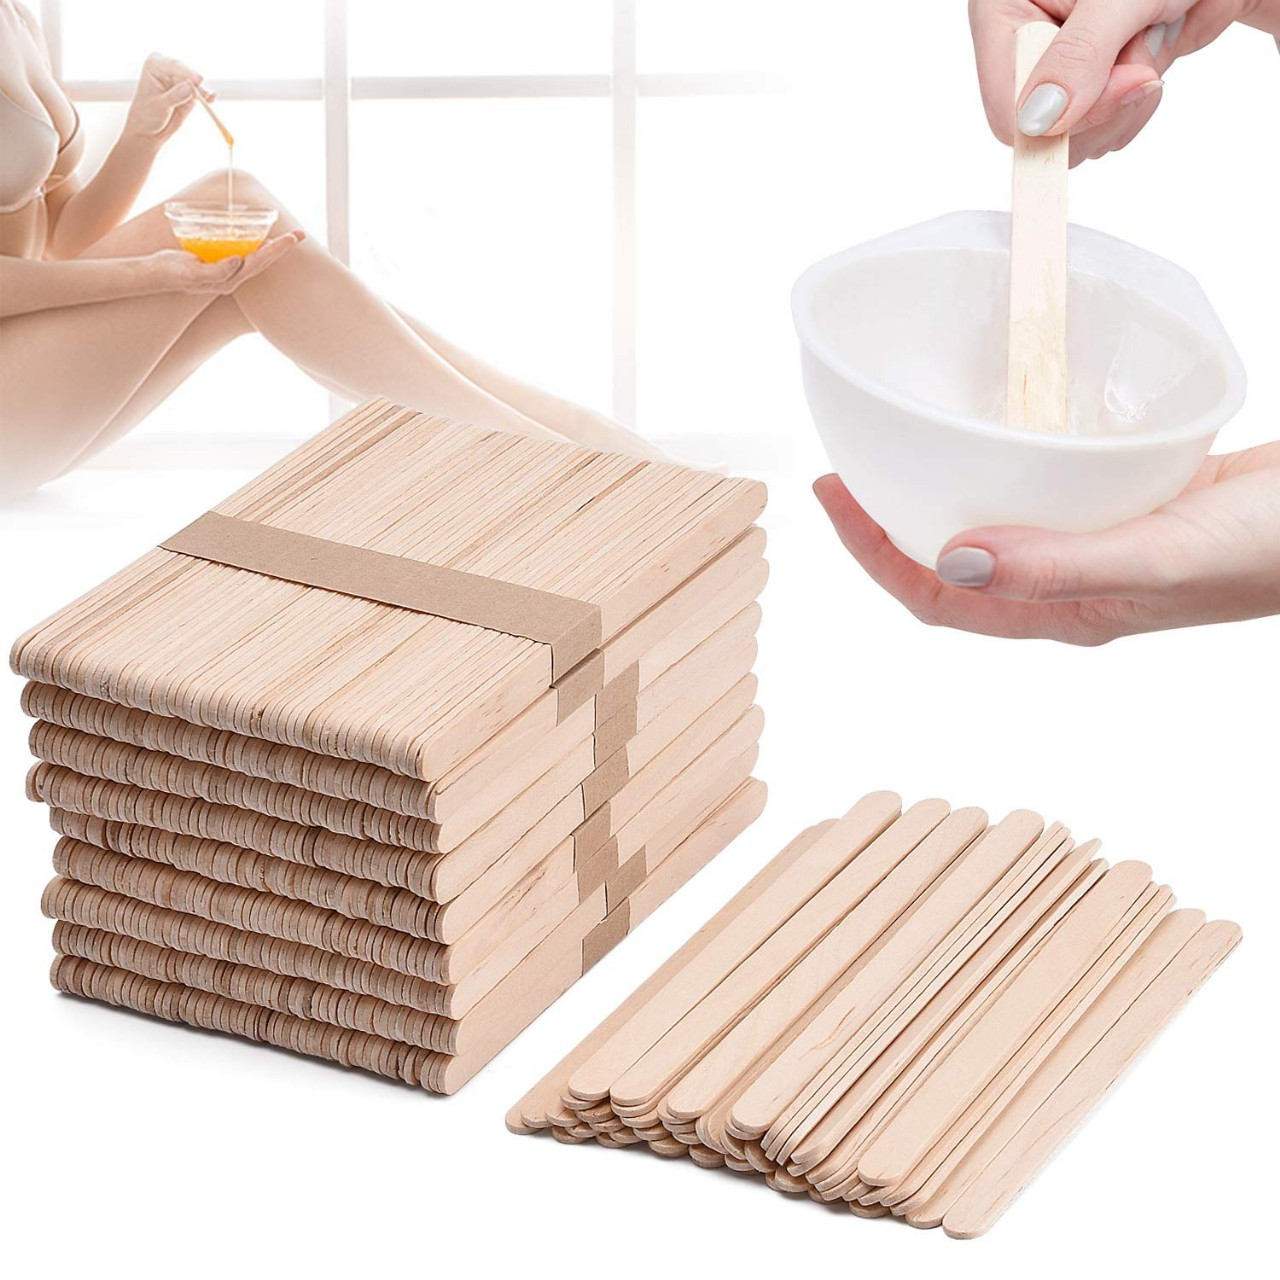 Noverlife 500 PCS Wax Applicator Sticks, Large Popsicle Sticks, Wooden Craft Eyebrow Waxing Sticks